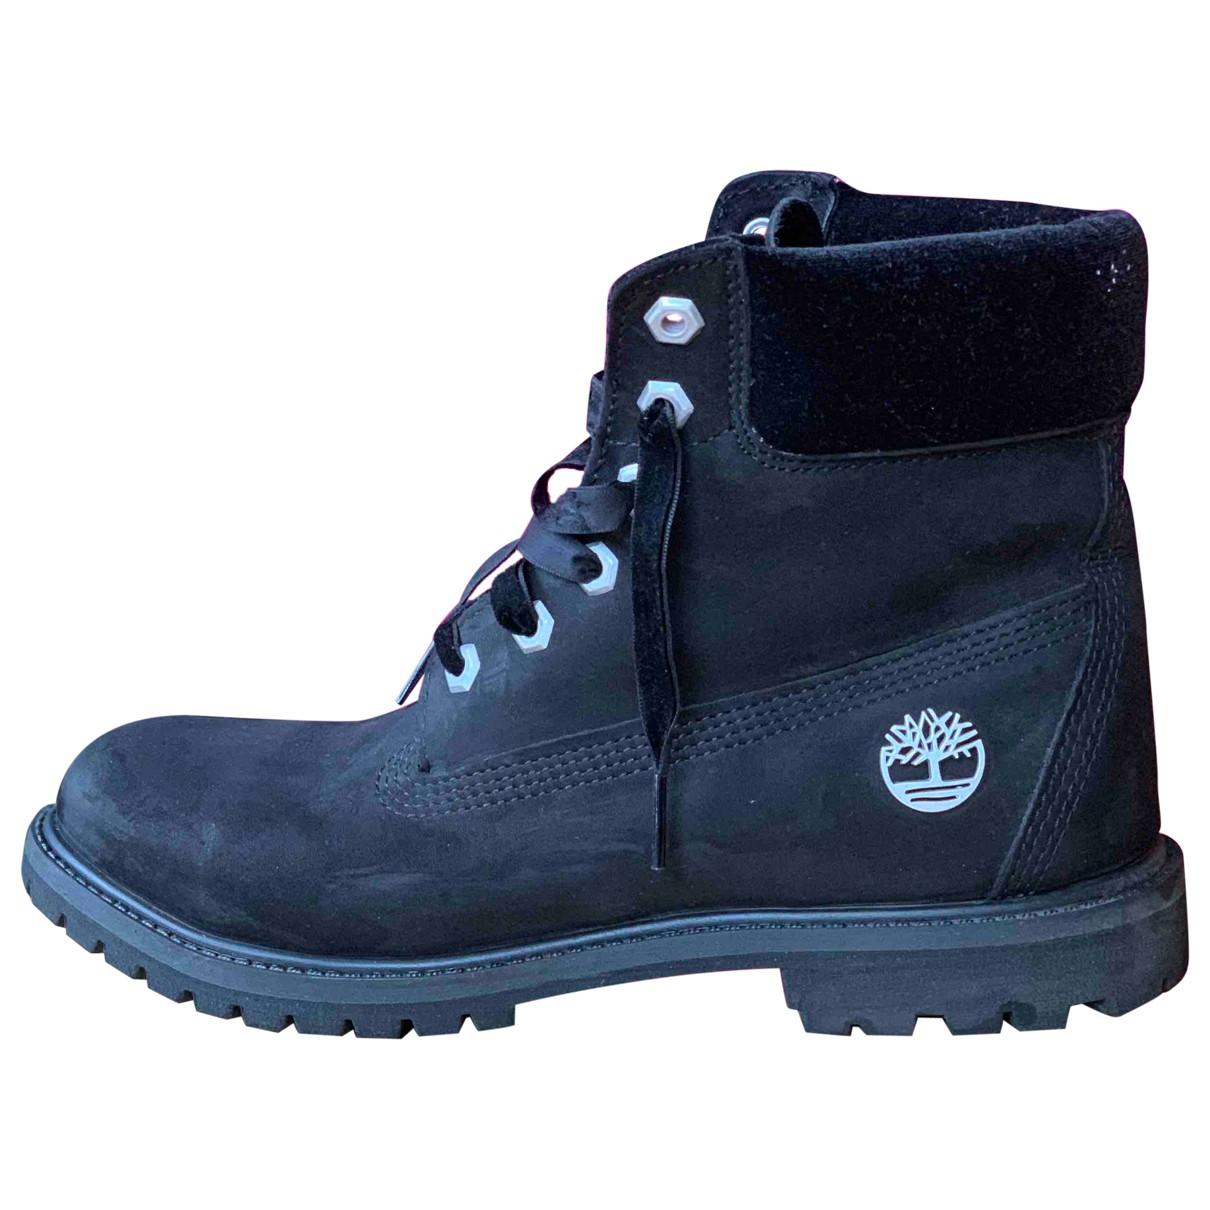 Timberland - Boots   pour femme en cuir - noir